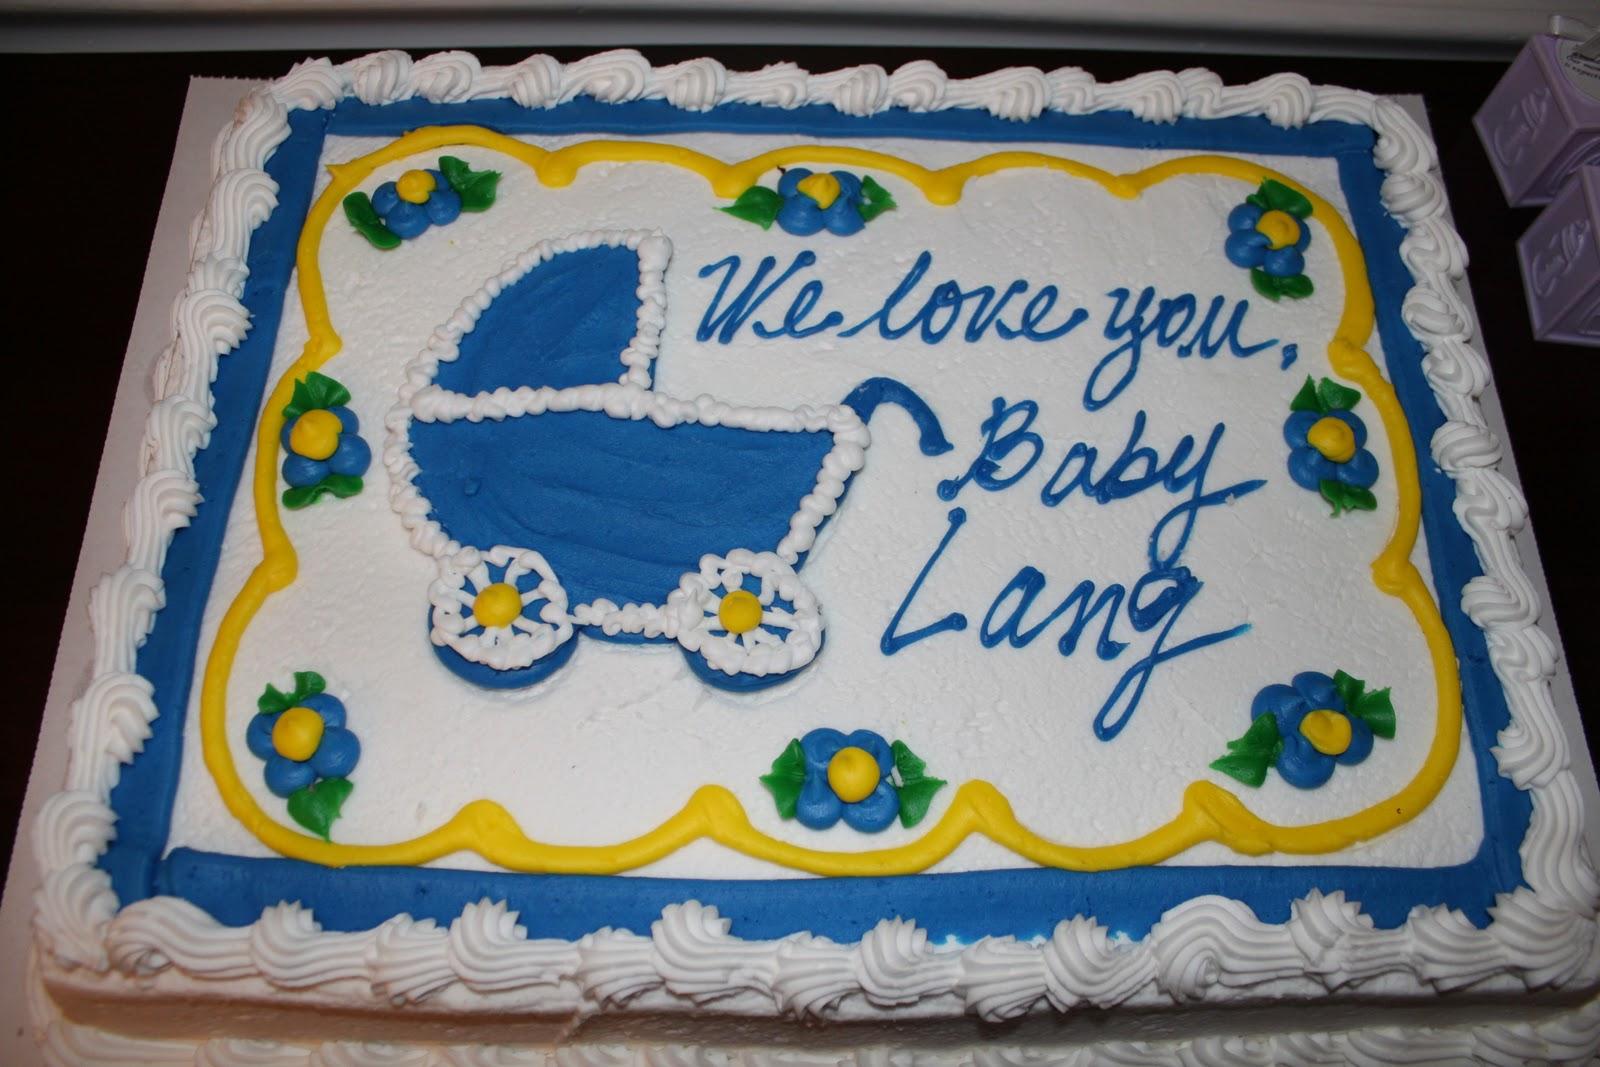 8 Costco Baby Boy Shower Cakes Photo Costco Baby Shower Cakes